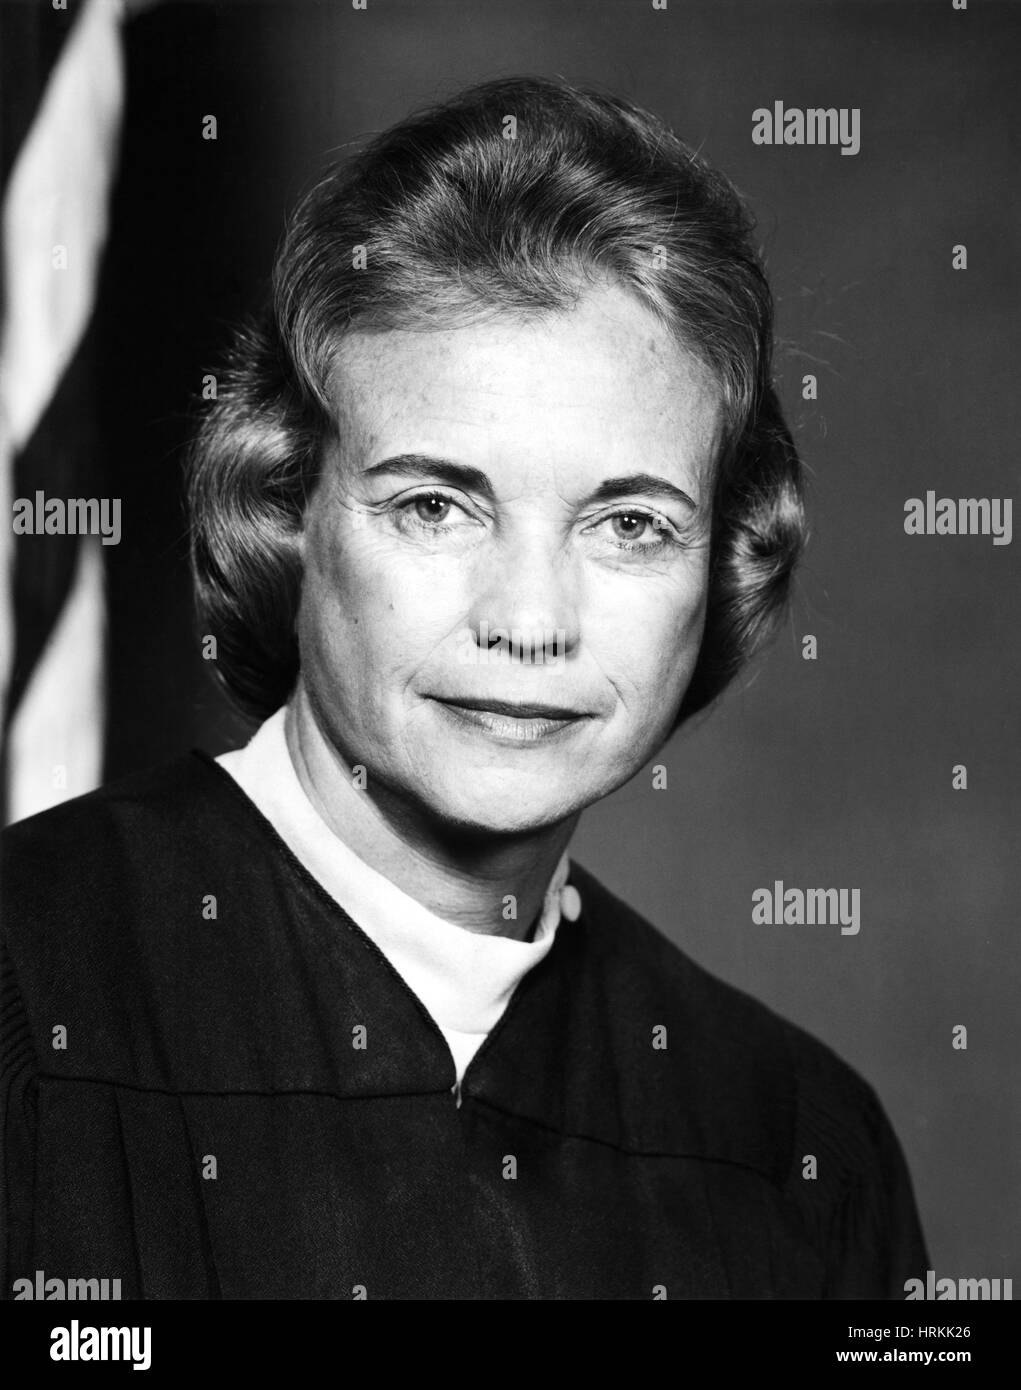 Sandra D. O'Connor, U.S. Supreme Court Justice - Stock Image